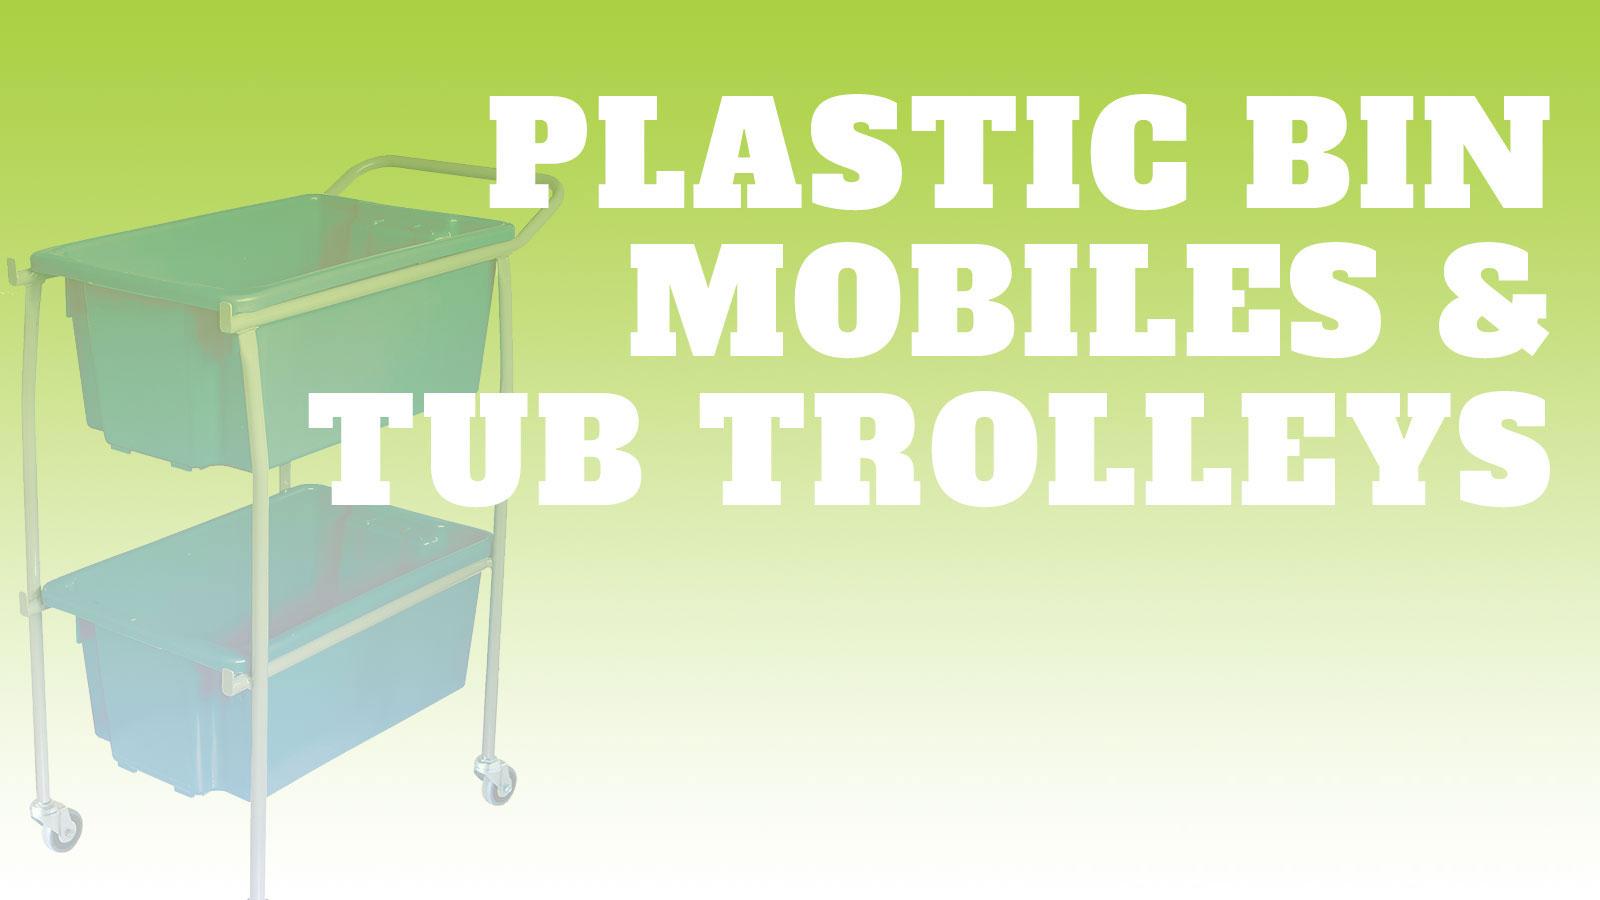 Warehouse-Plastic-Bin-Mobiles-&-Tub